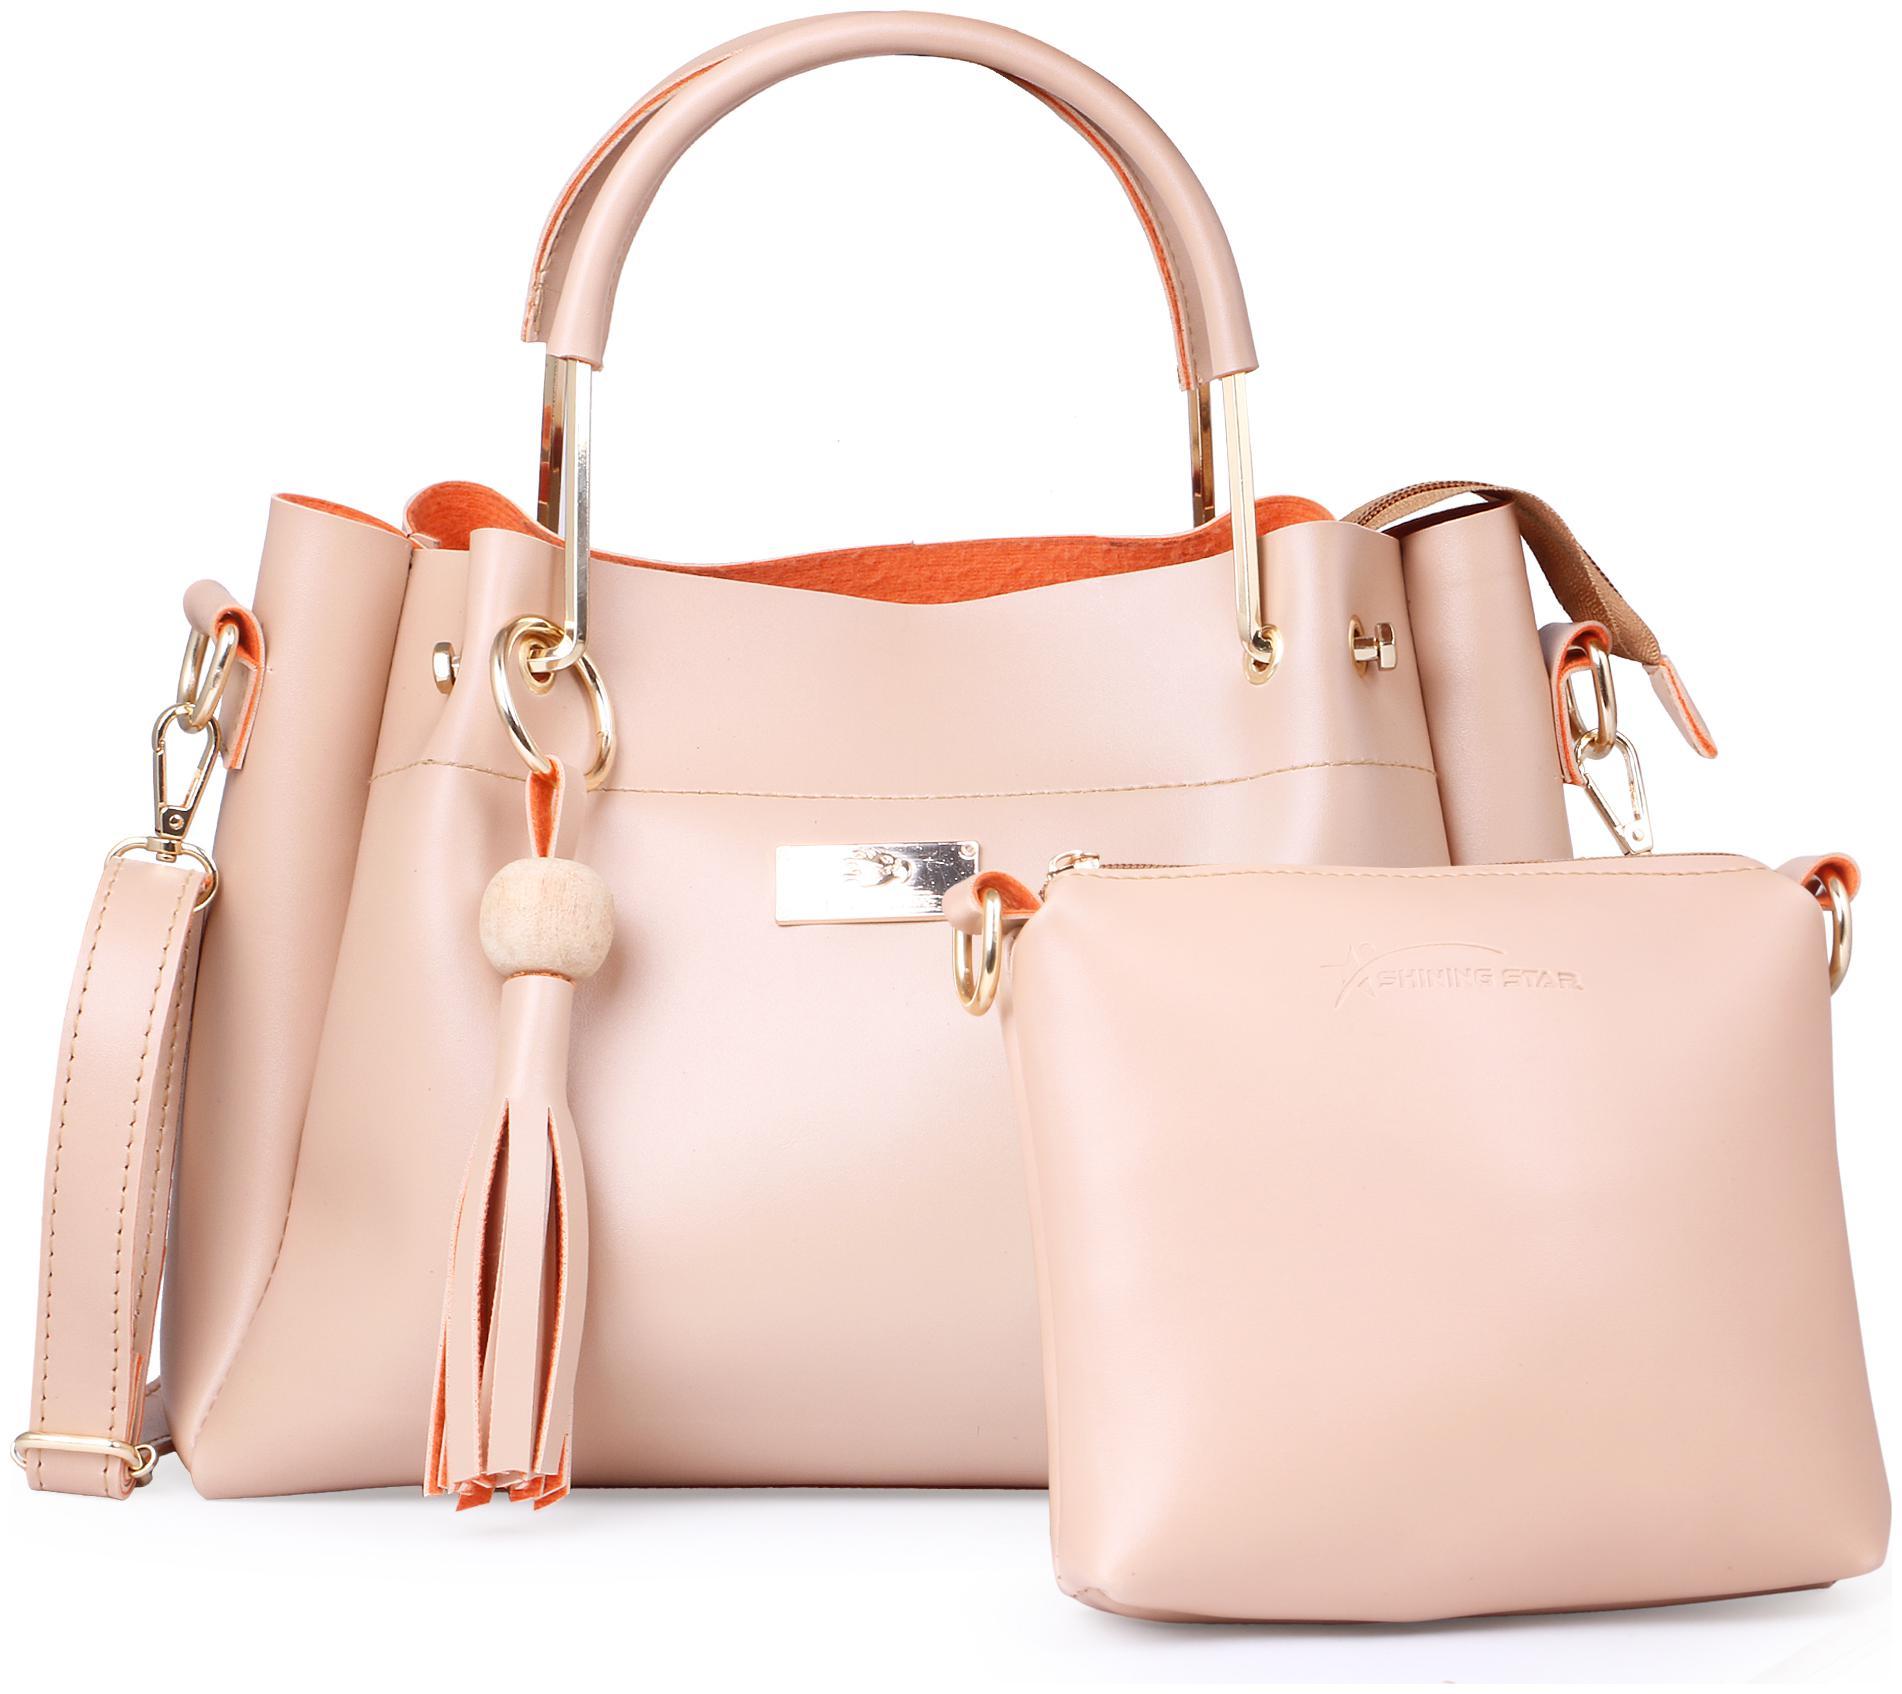 NEW  WOMEN PURSES LADIES HAND BAGS CLASSIC GIRLS CANVAS STAR PRINT CLUTCH BAG